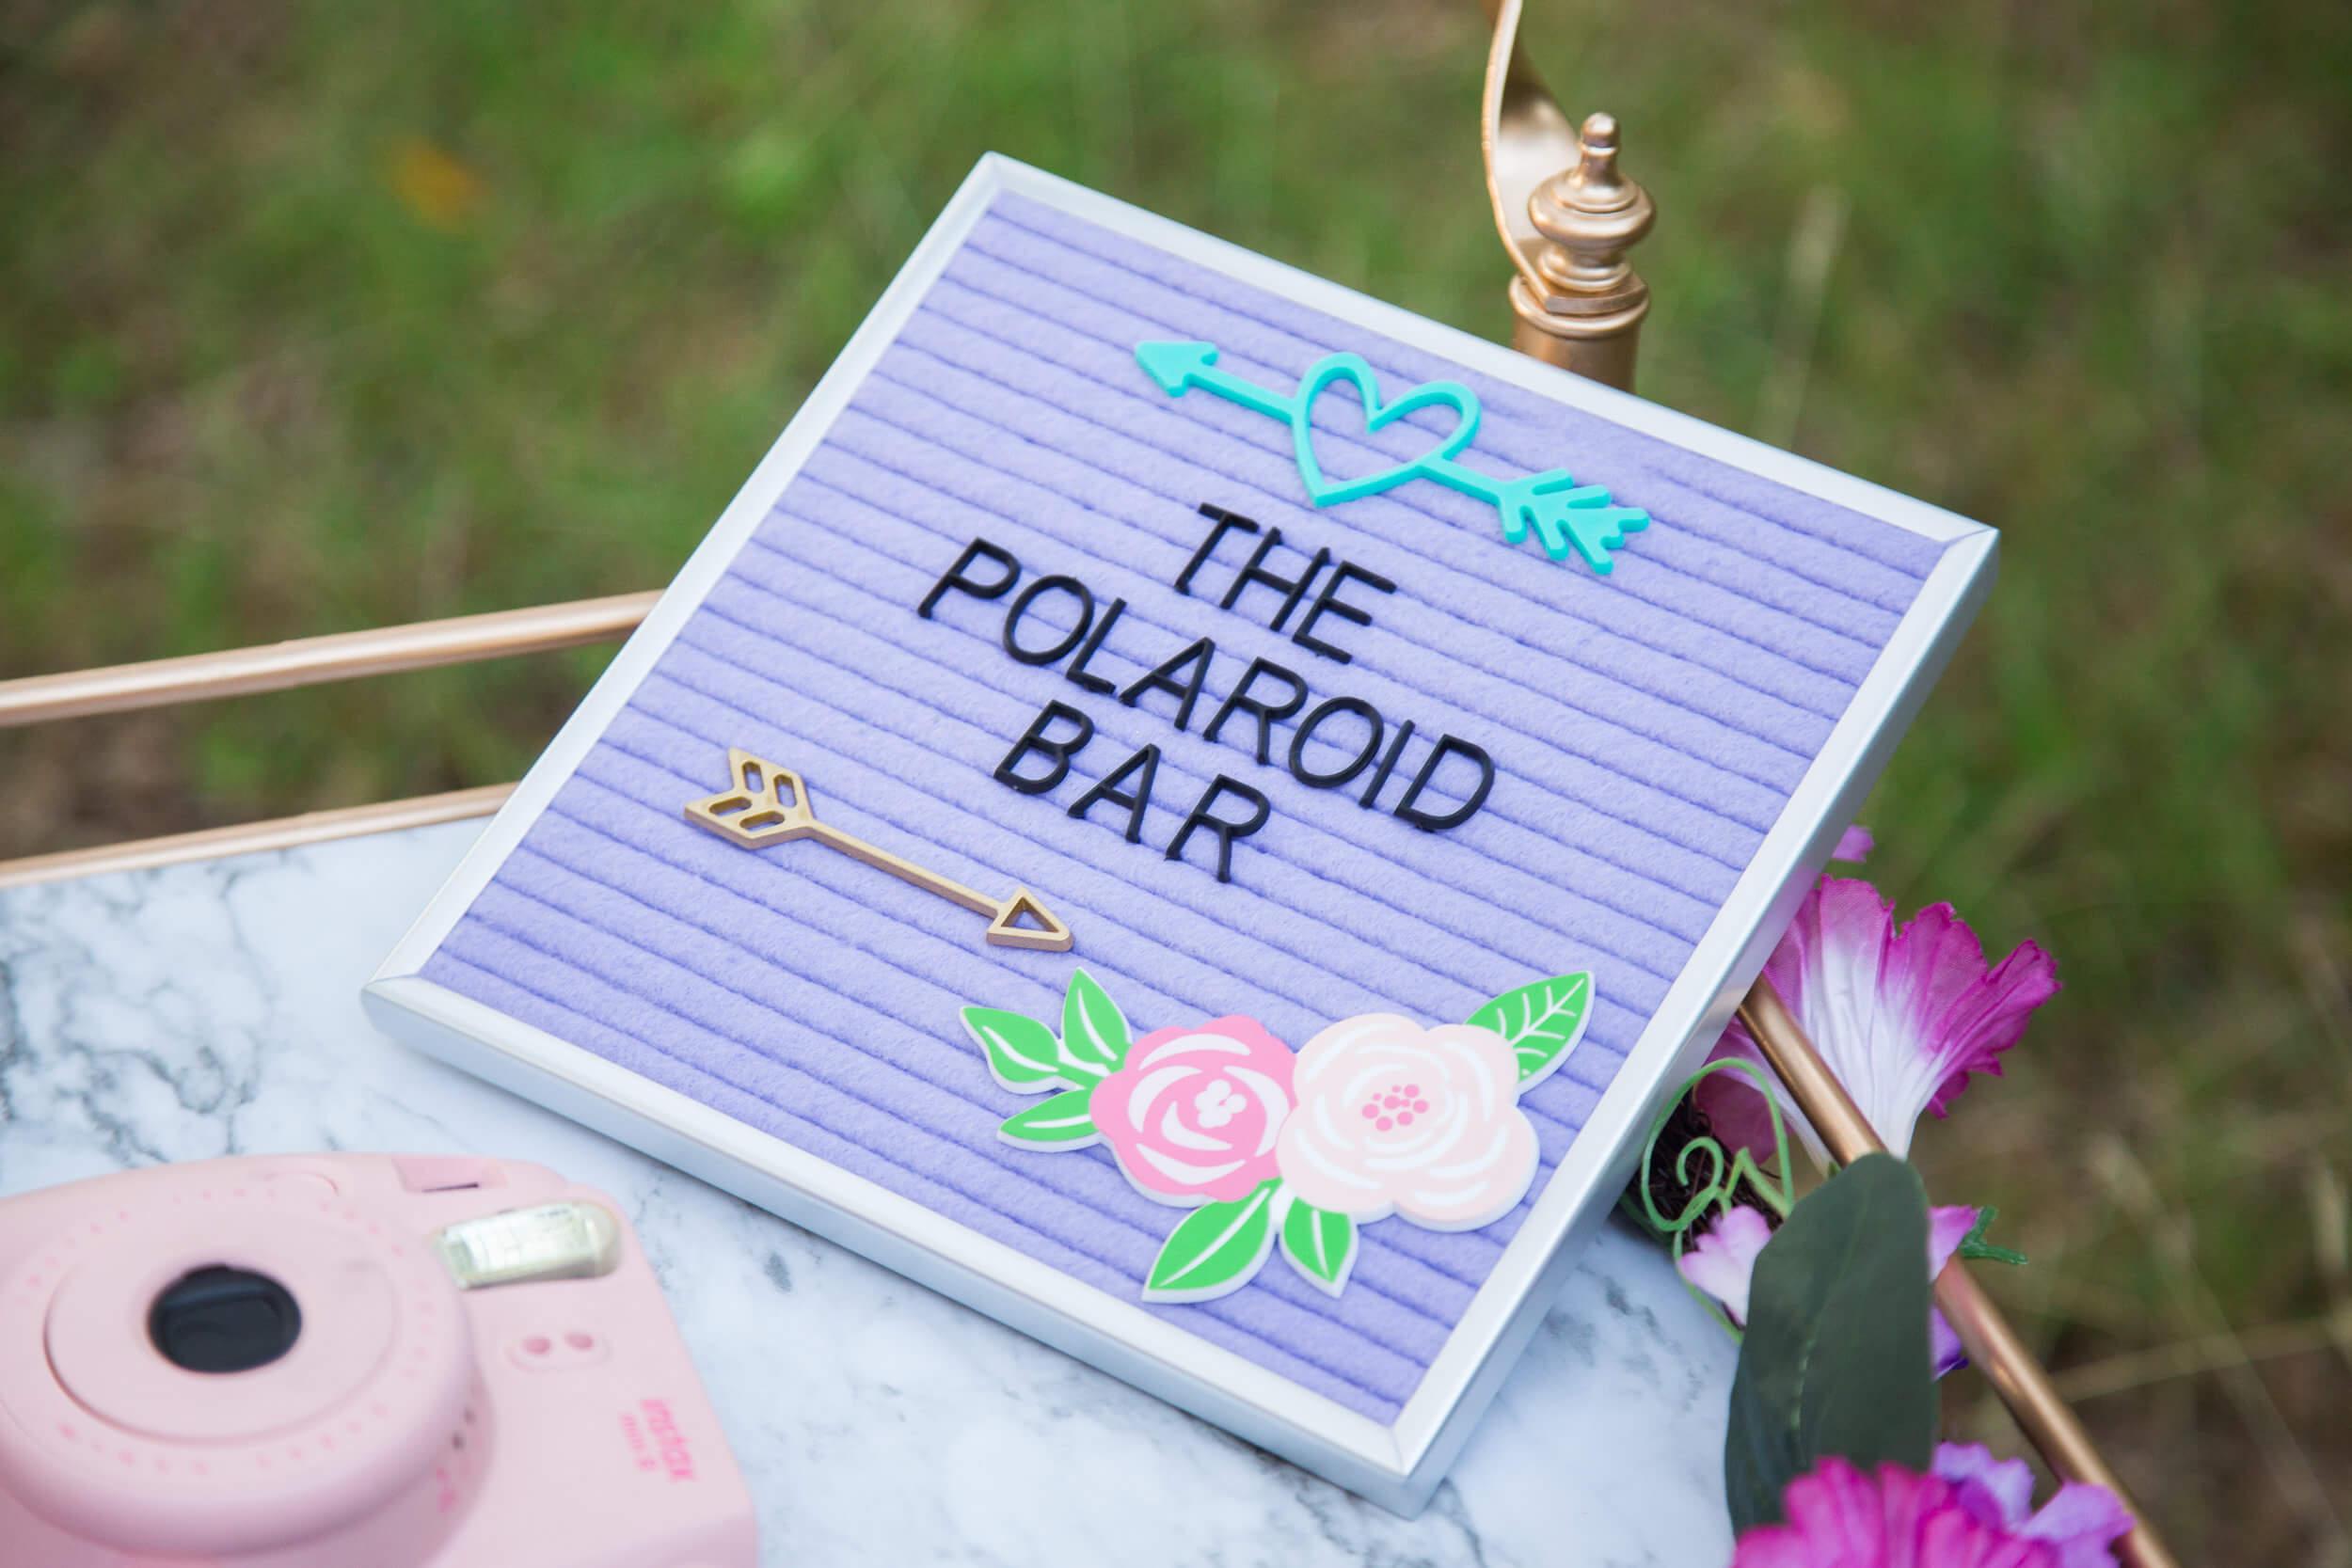 polaroid bar